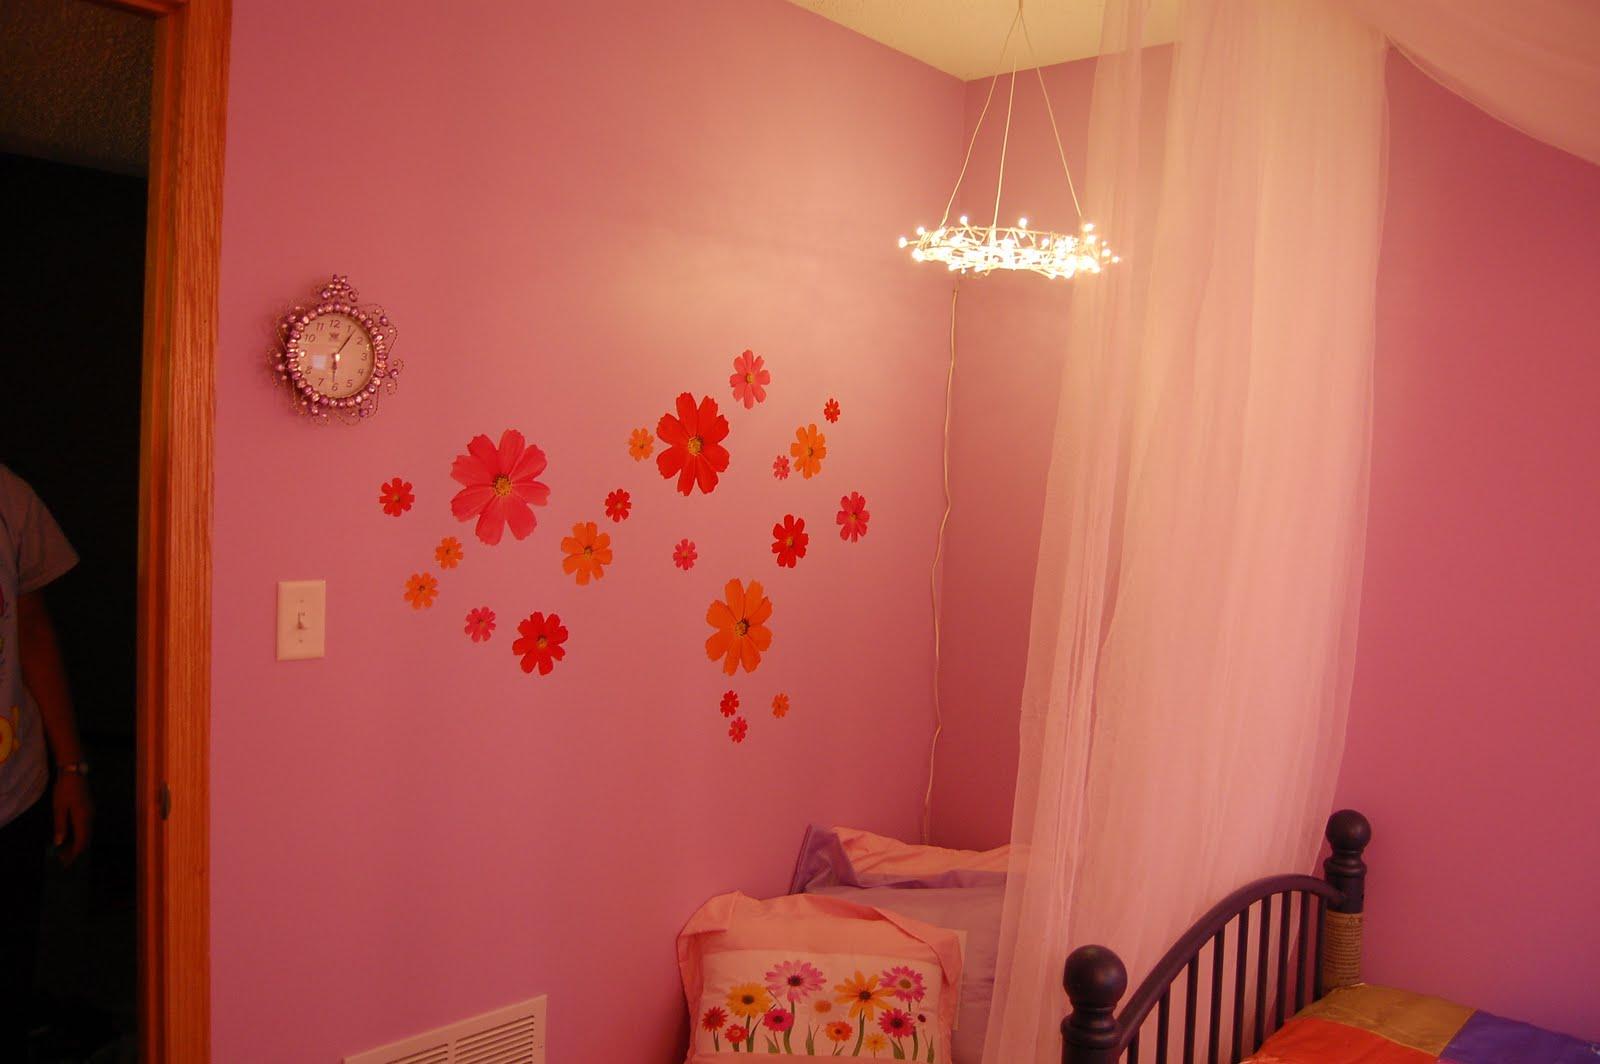 Bedroom fairy lights ikea - Bedroom Fairy Lights Ikea Bedroom Furniture High Resolution